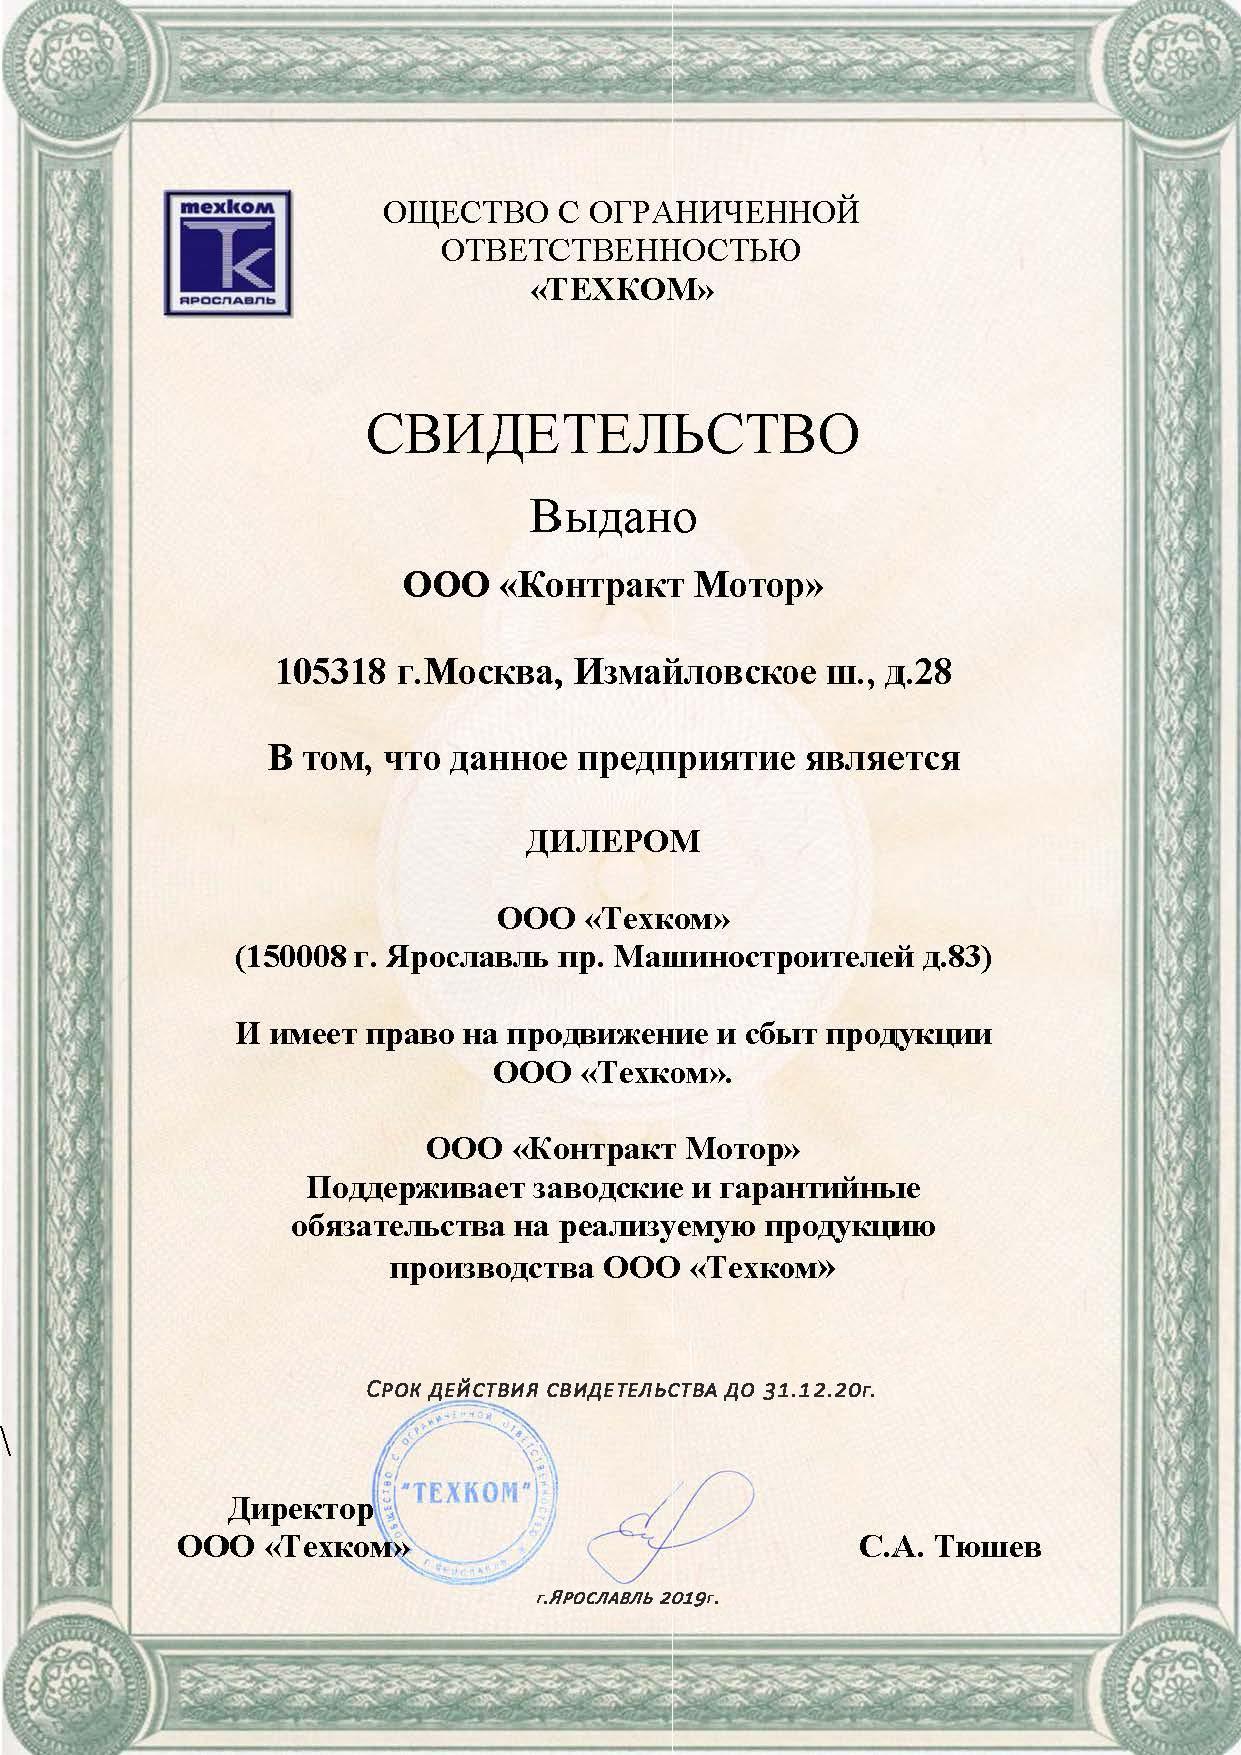 Сертификат ООО «Техком»